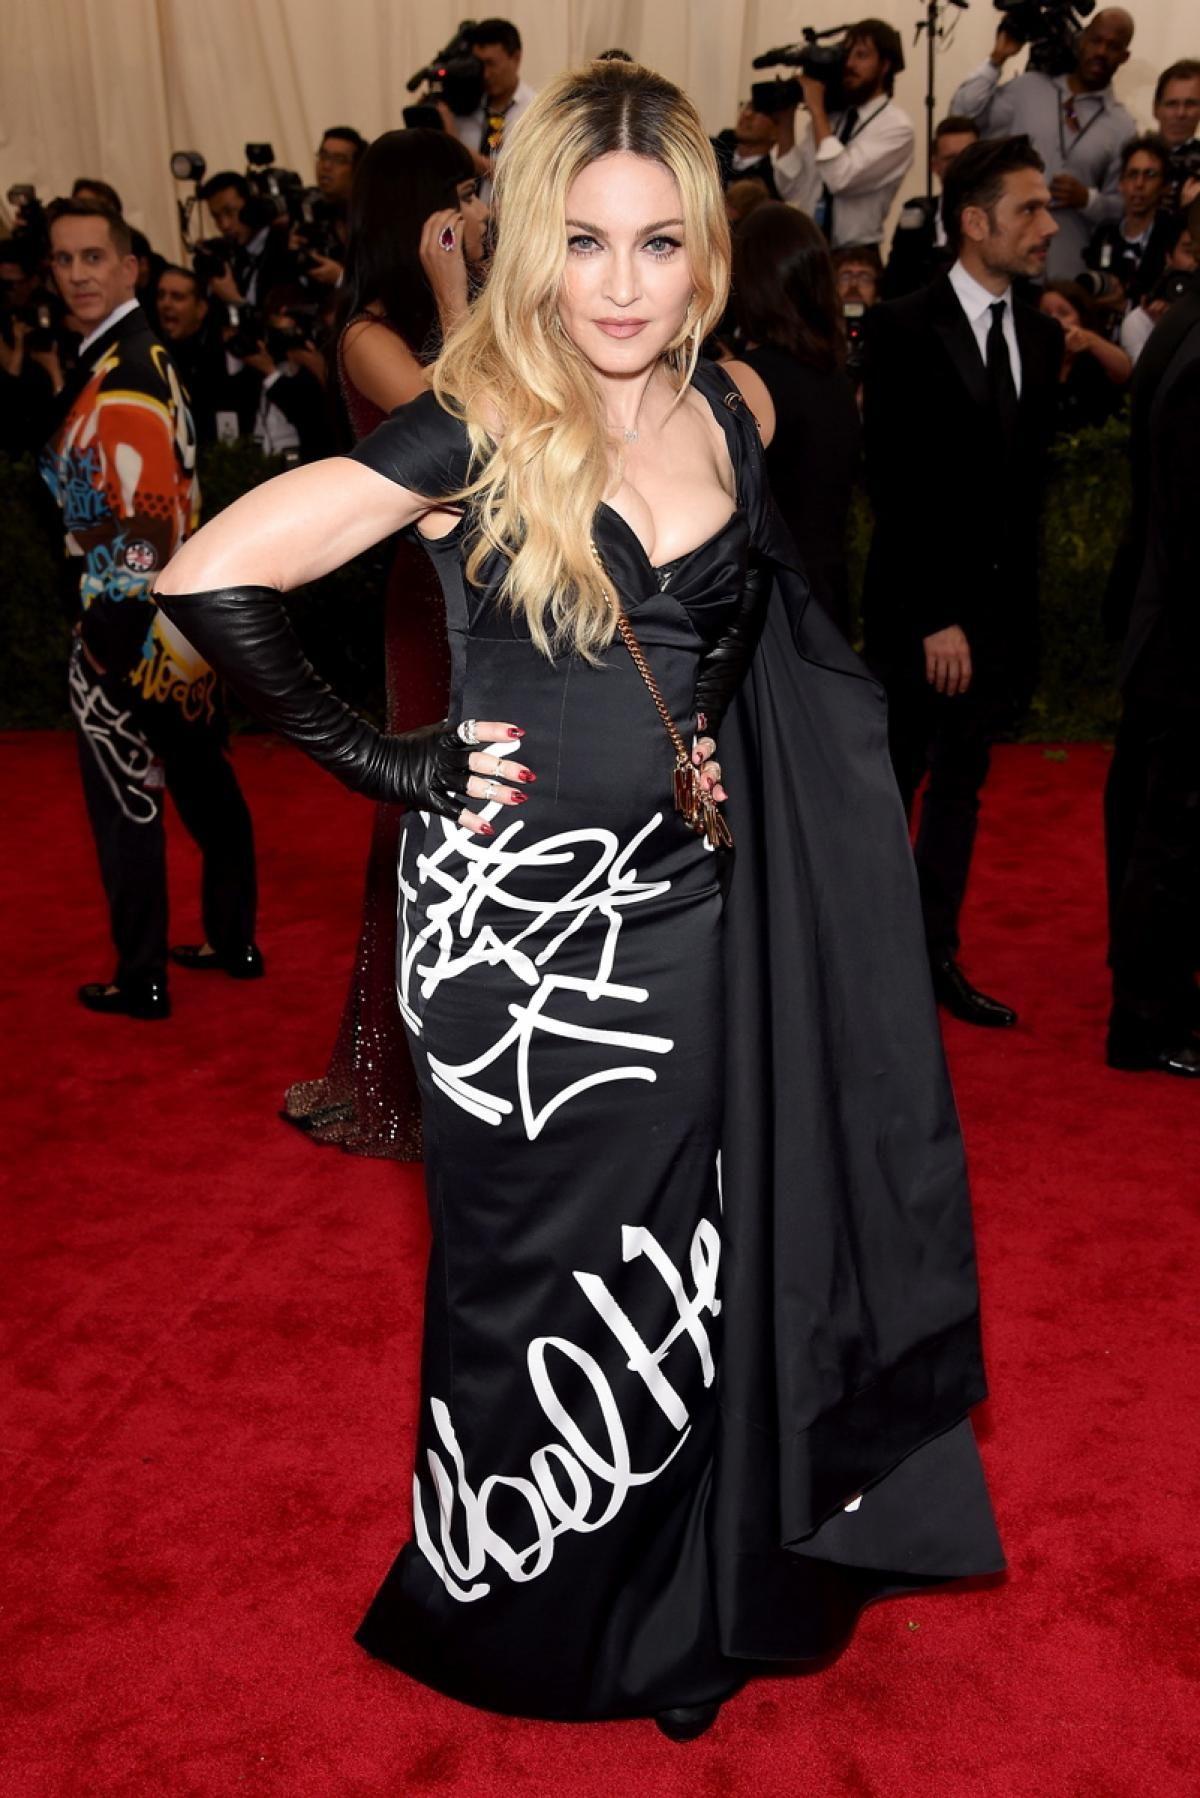 Madonna Photos Met Gala 2015 Best And Worst Red Carpet Looks On Fashion S Biggest Night Met Gala Looks Fashion Nice Dresses